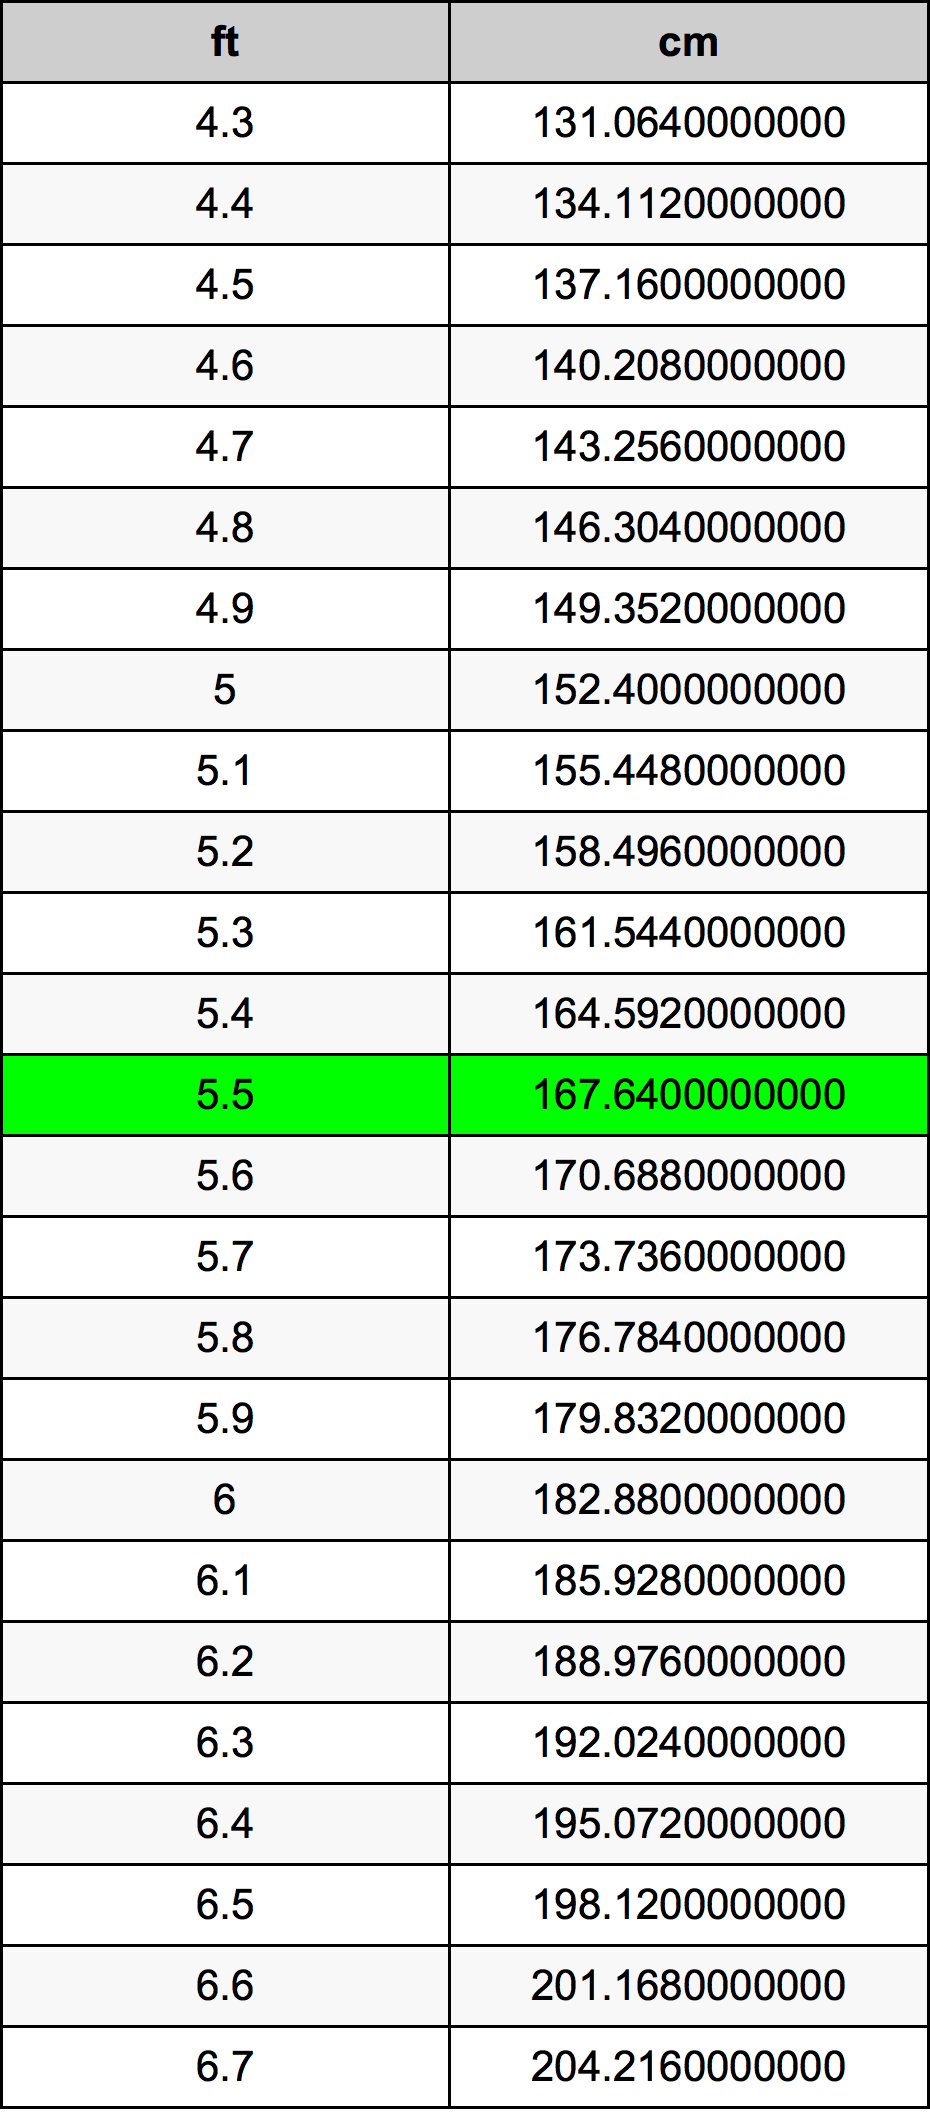 55 Feet To Centimeters Converter 55 Ft To Cm Converter